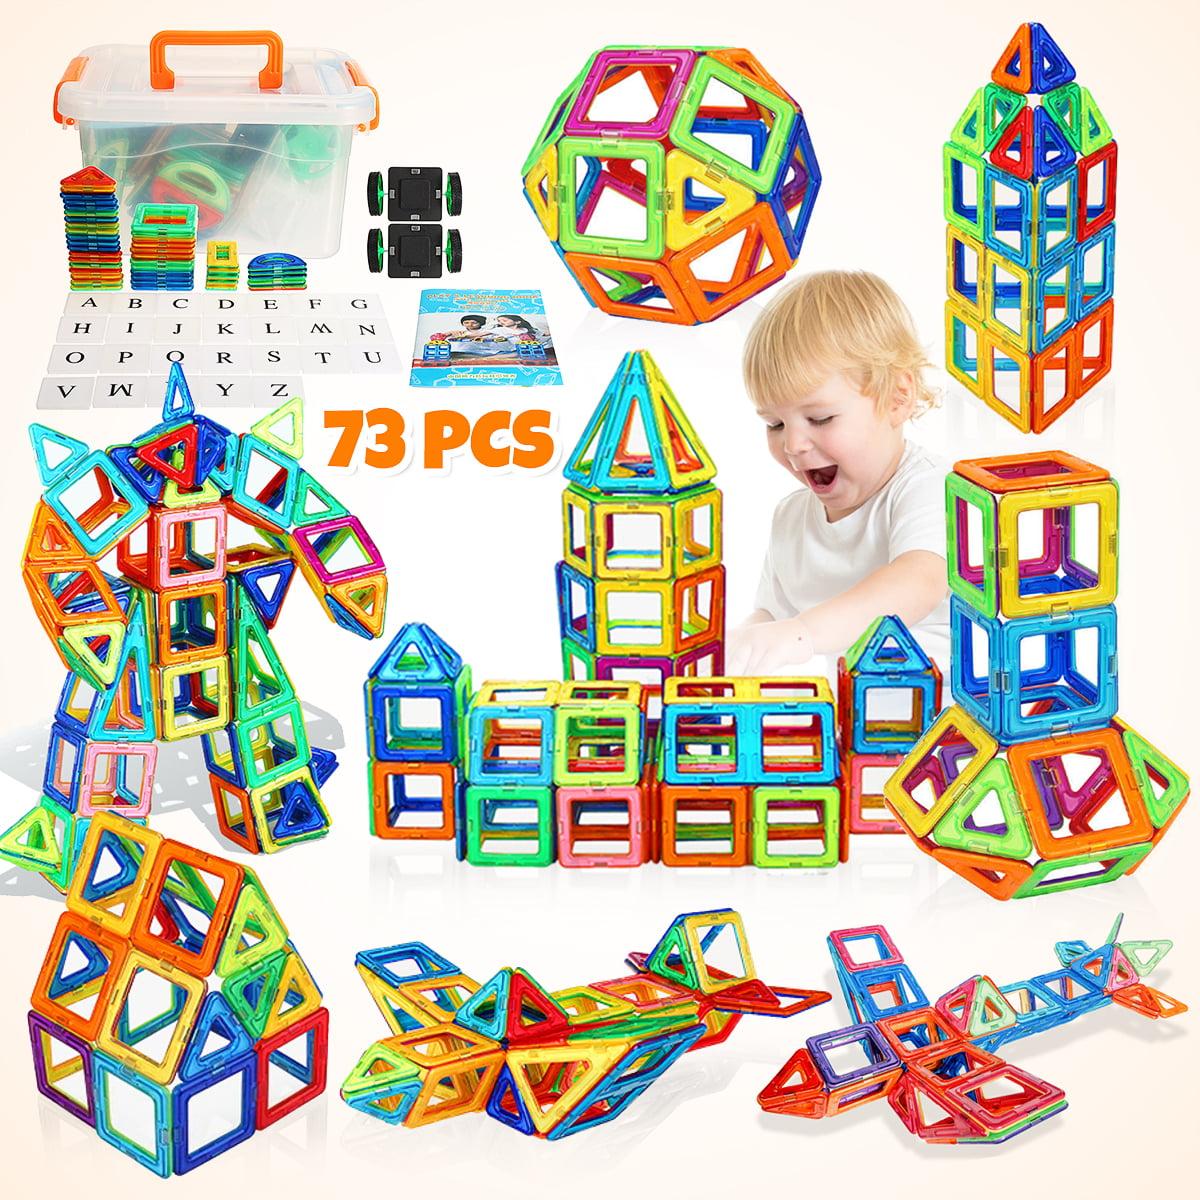 100pcs 3D Magnetic DIY Building Blocks Educational Kids Toys Box Manual